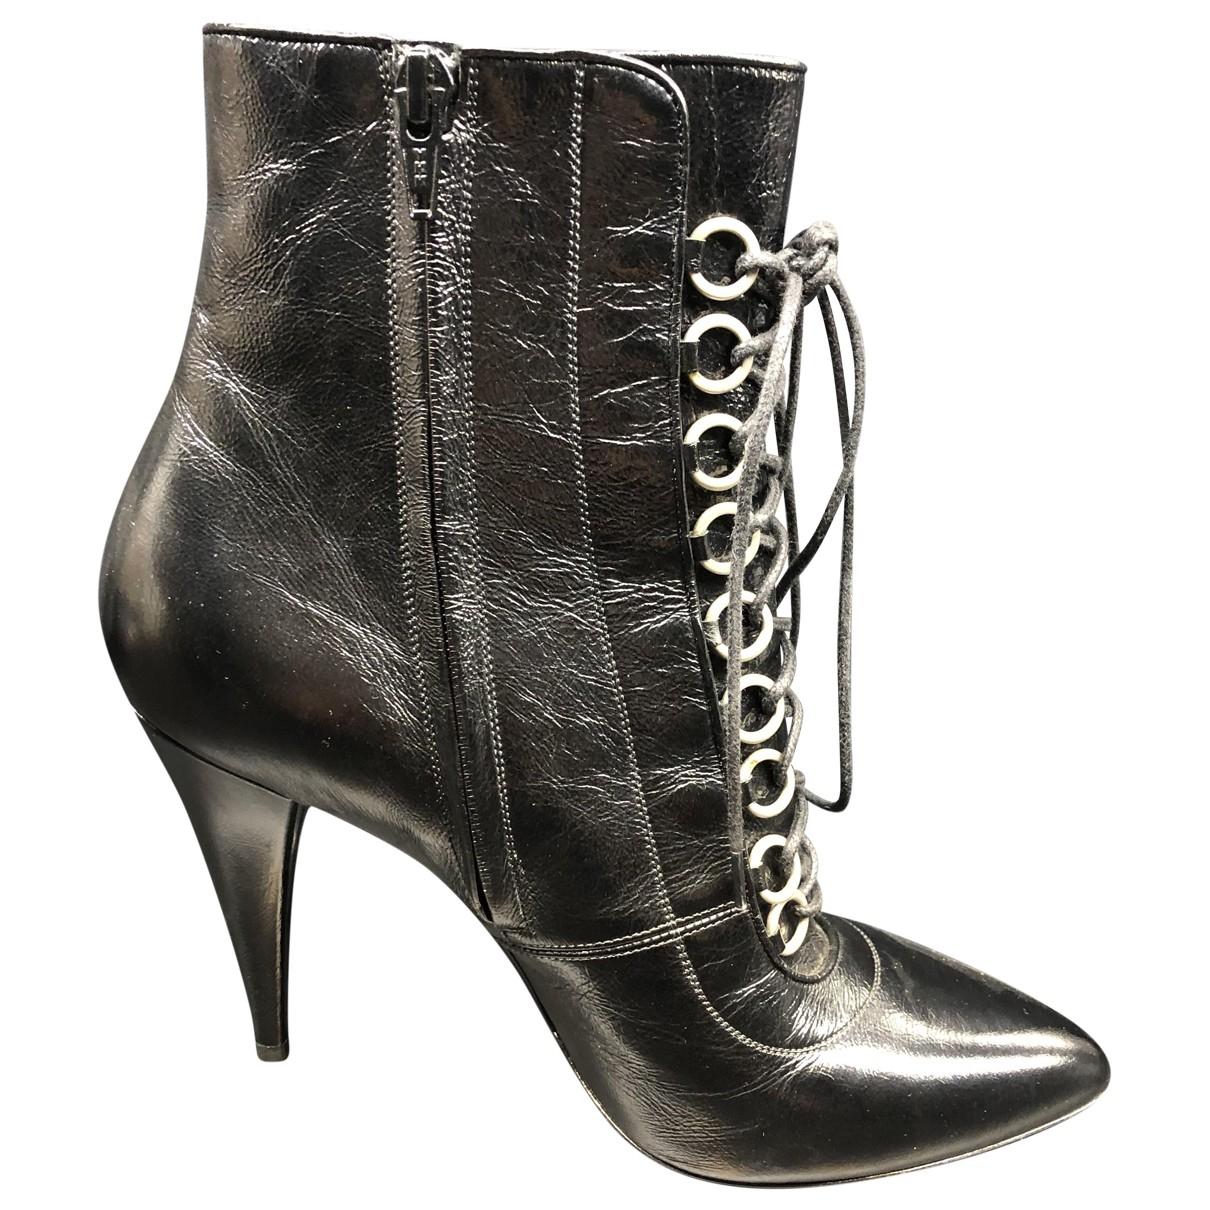 Saint Laurent N Black Leather Ankle boots for Women 40 IT